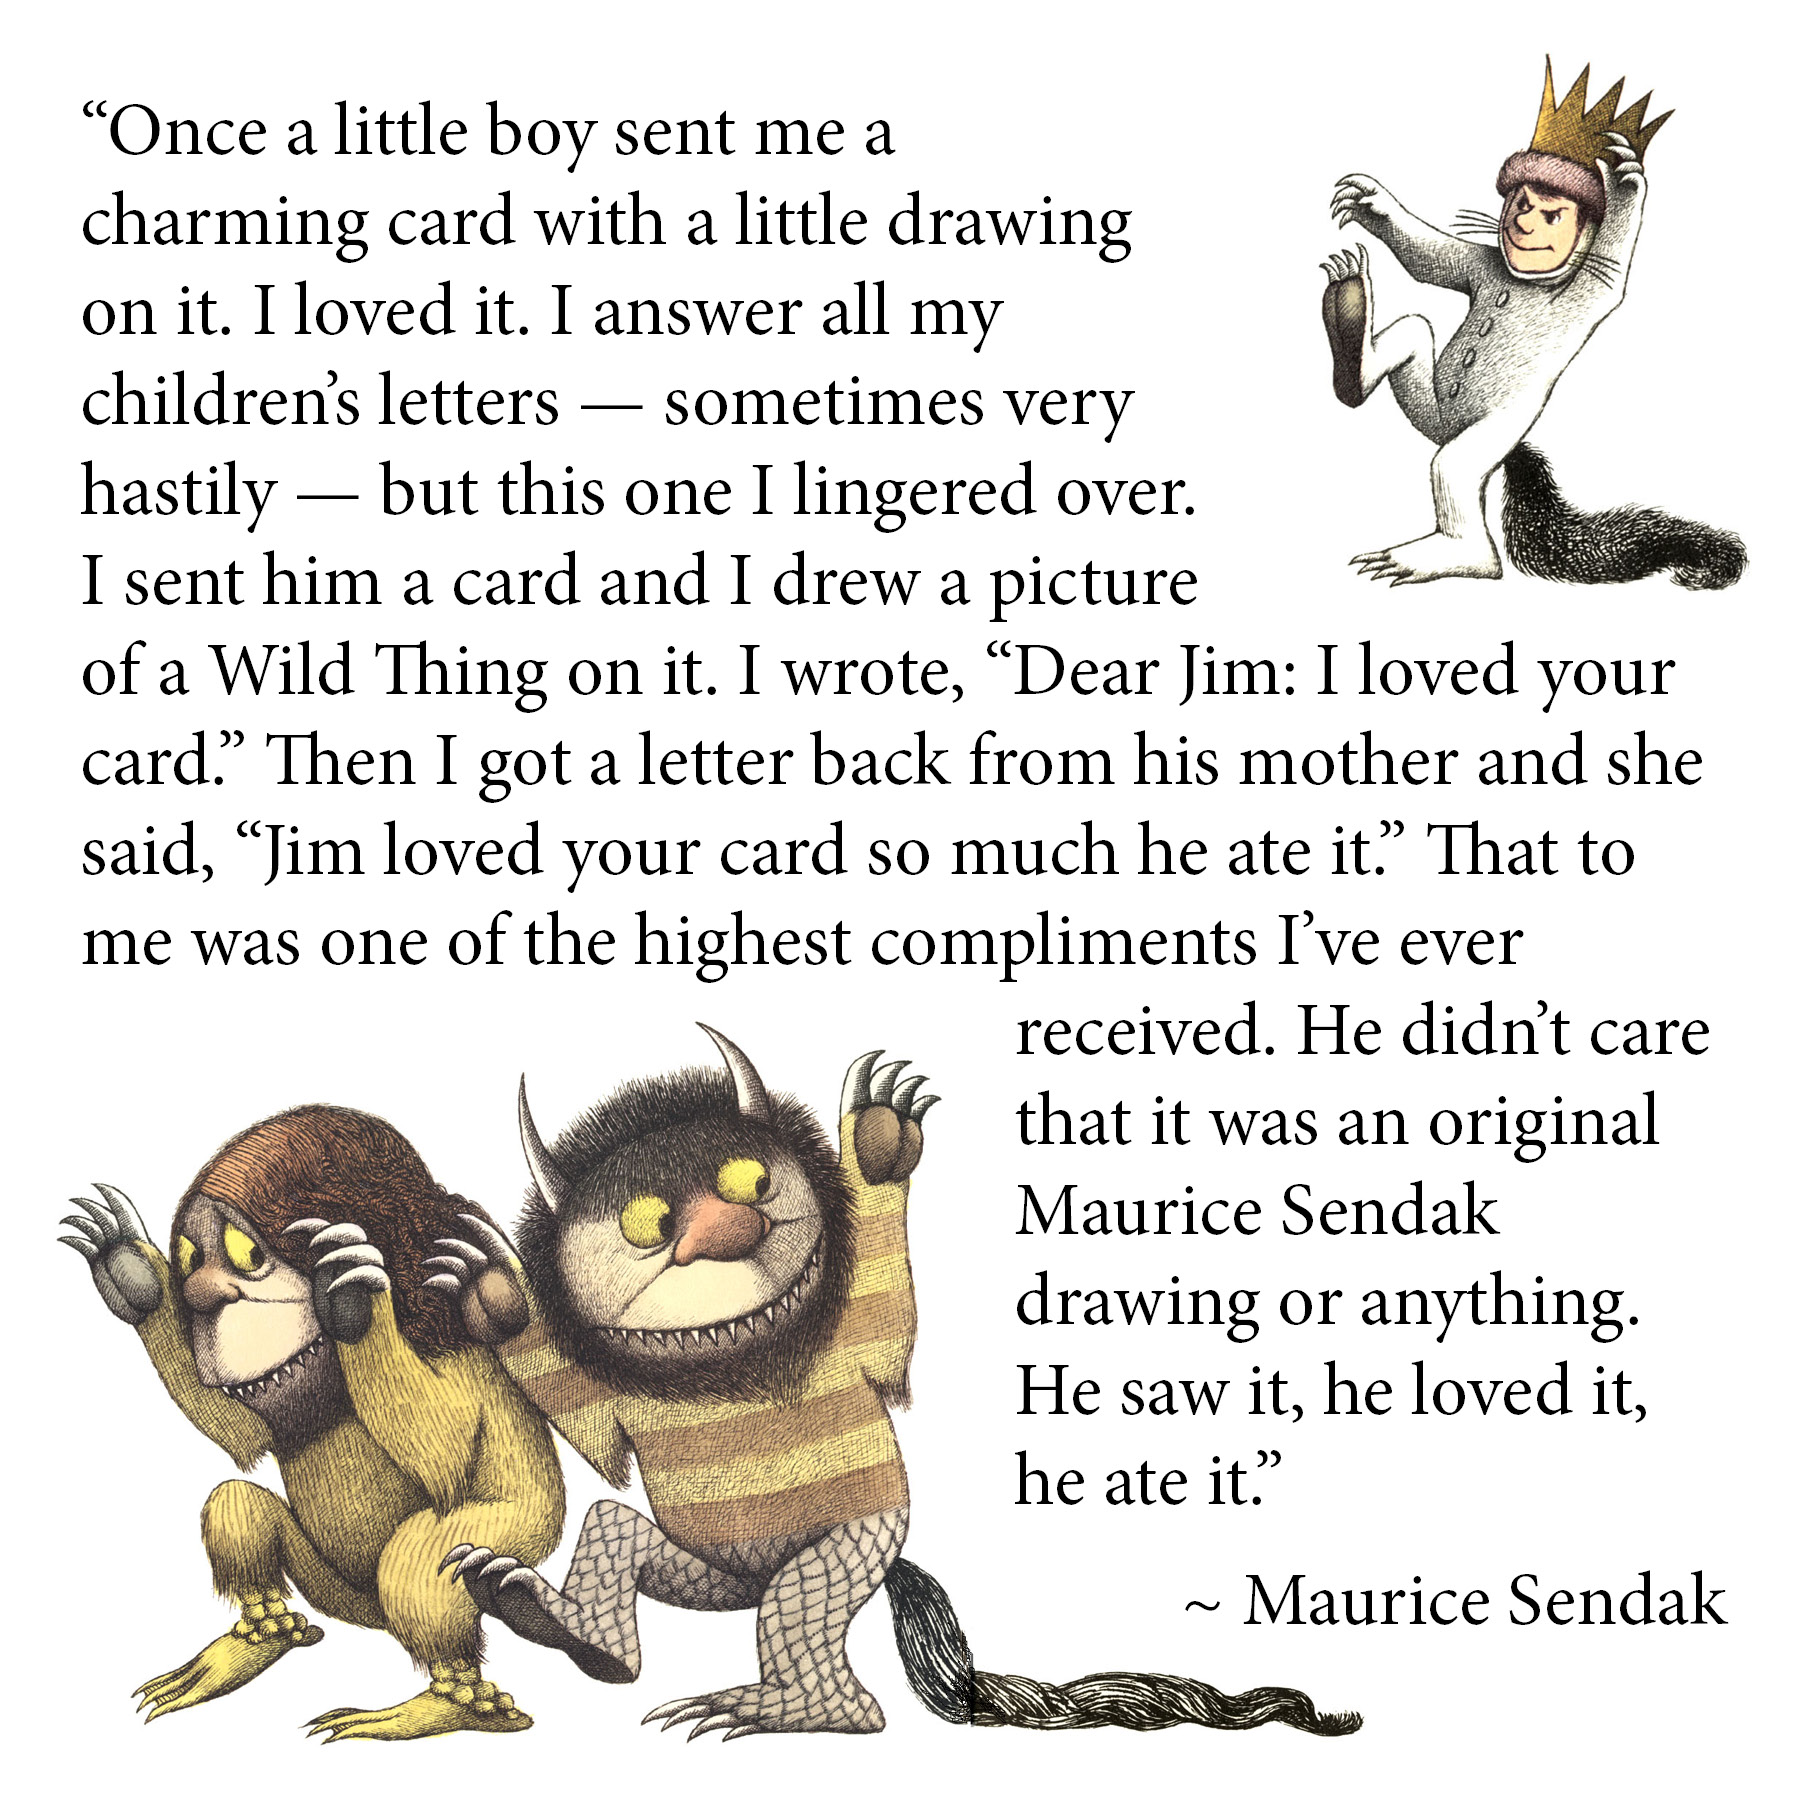 Maurice Sendak's quote #1